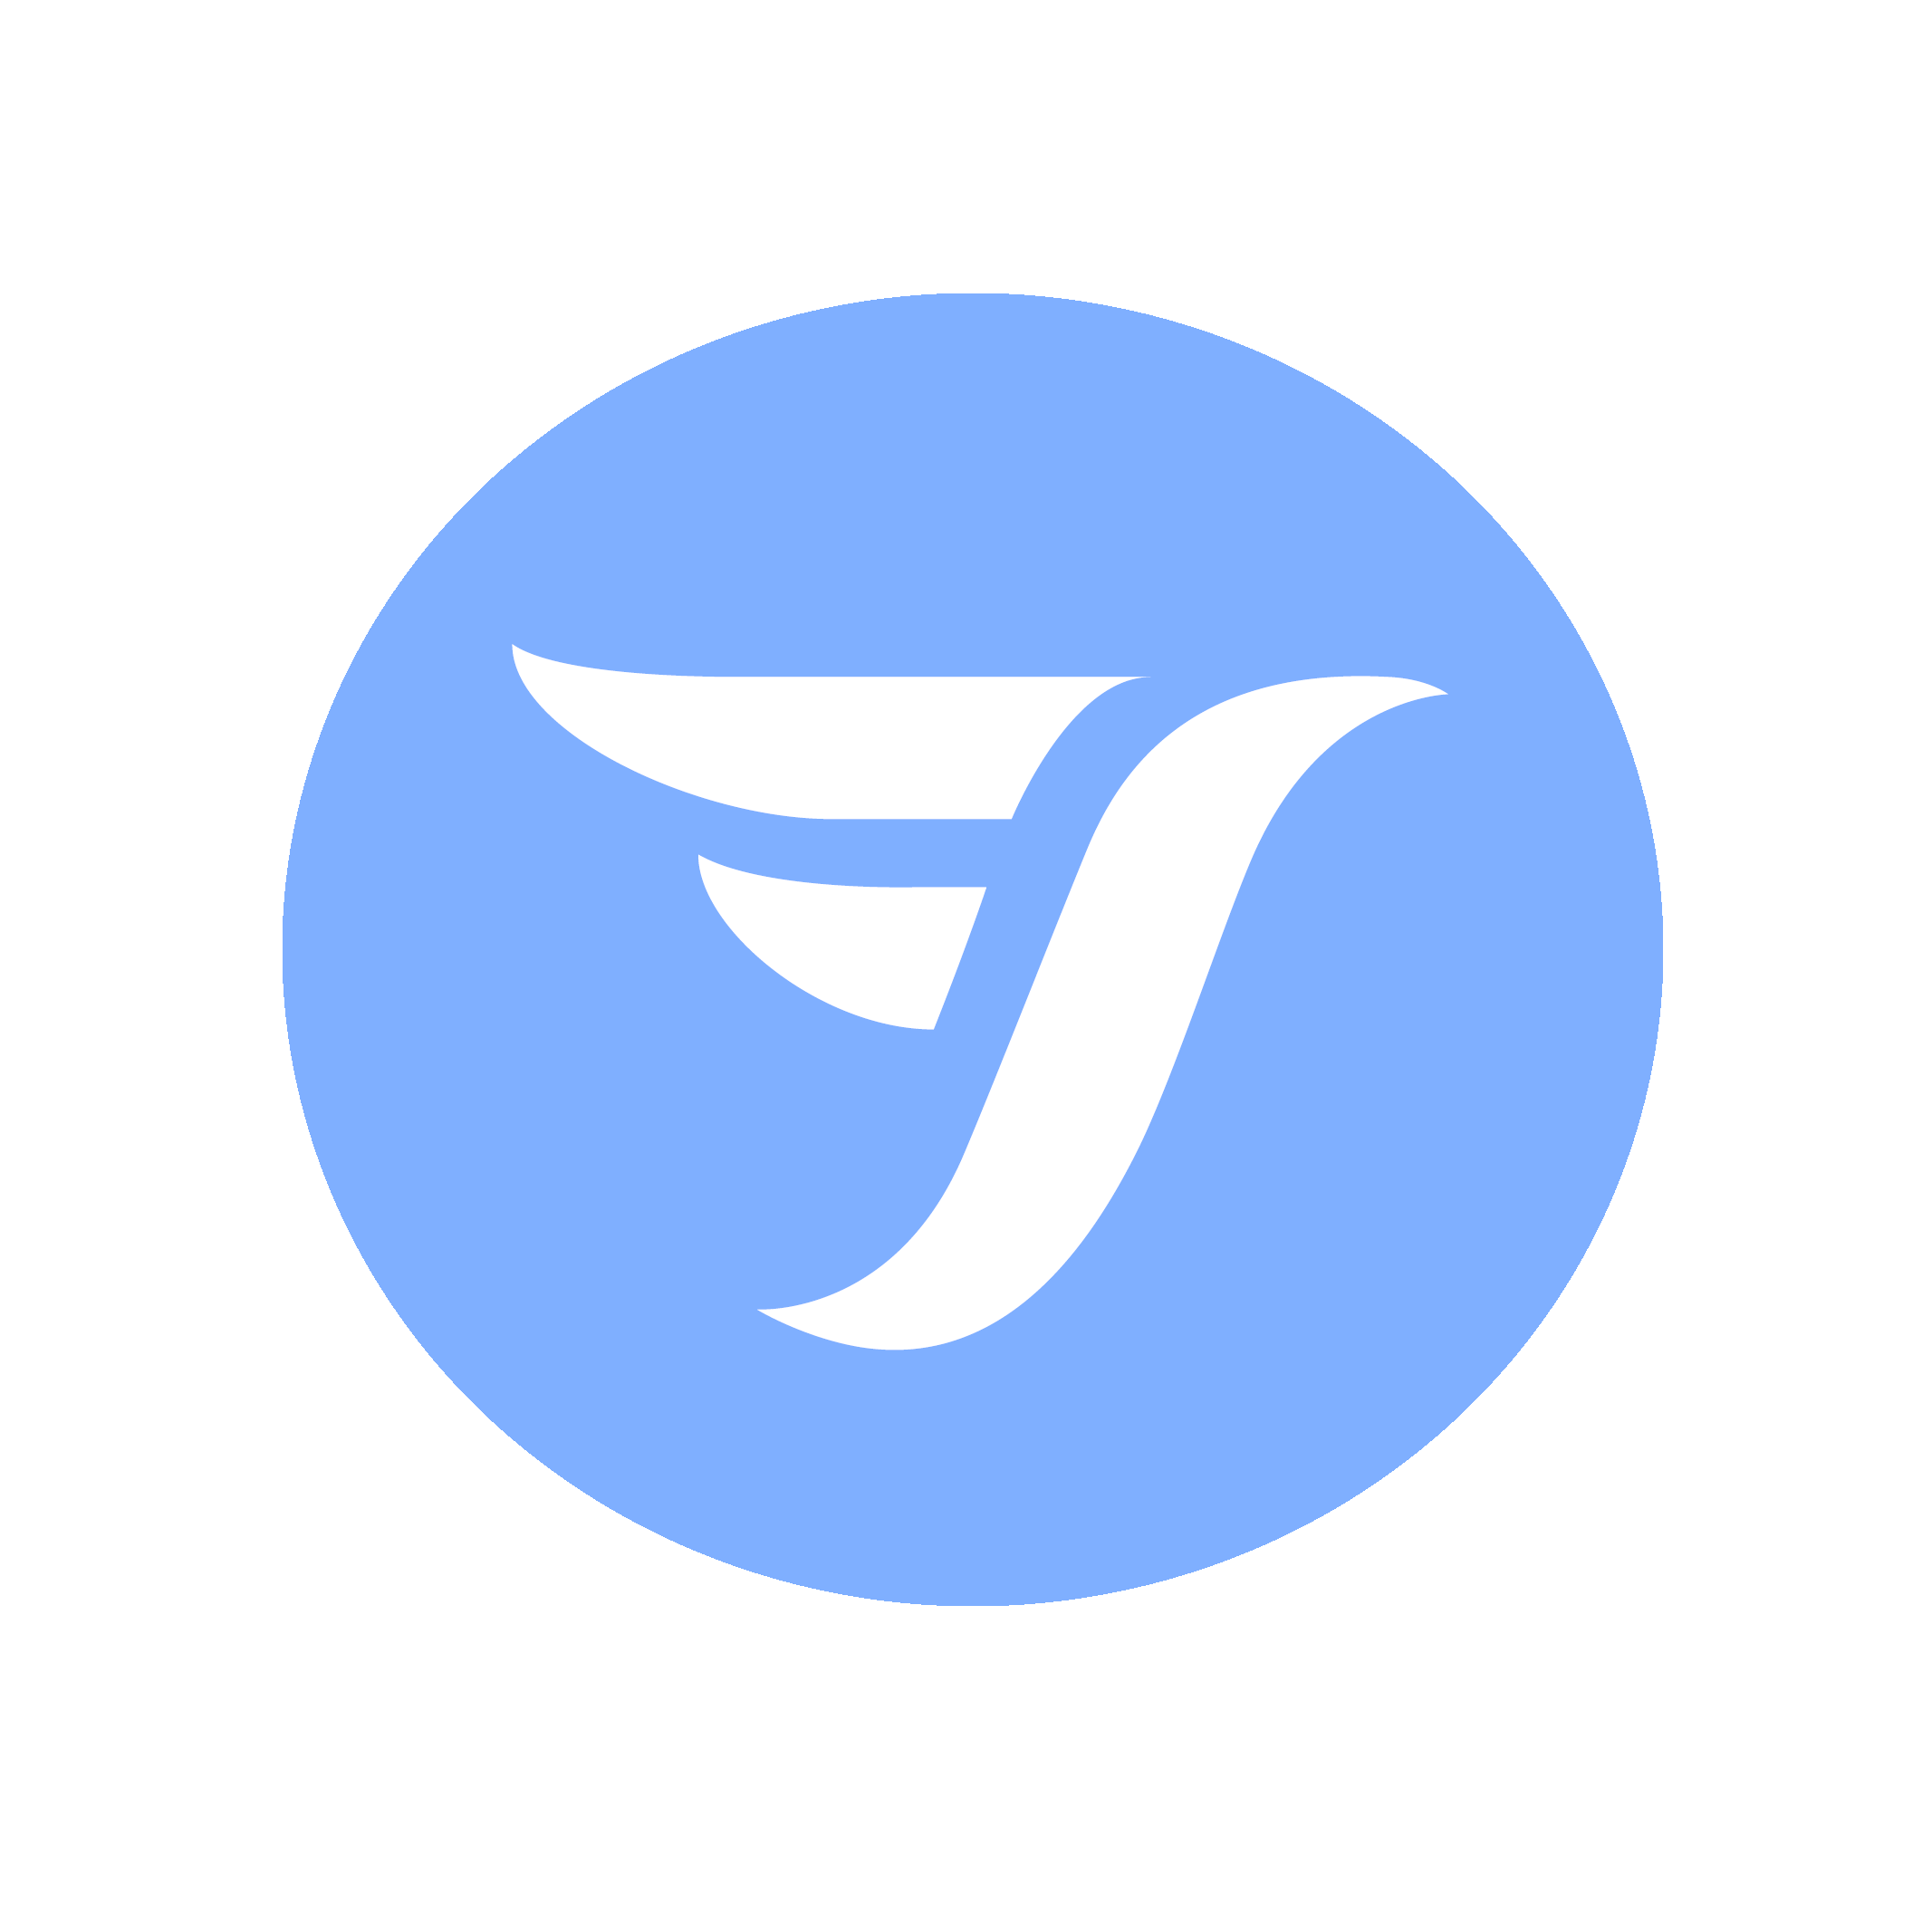 bluepass_symbol.png